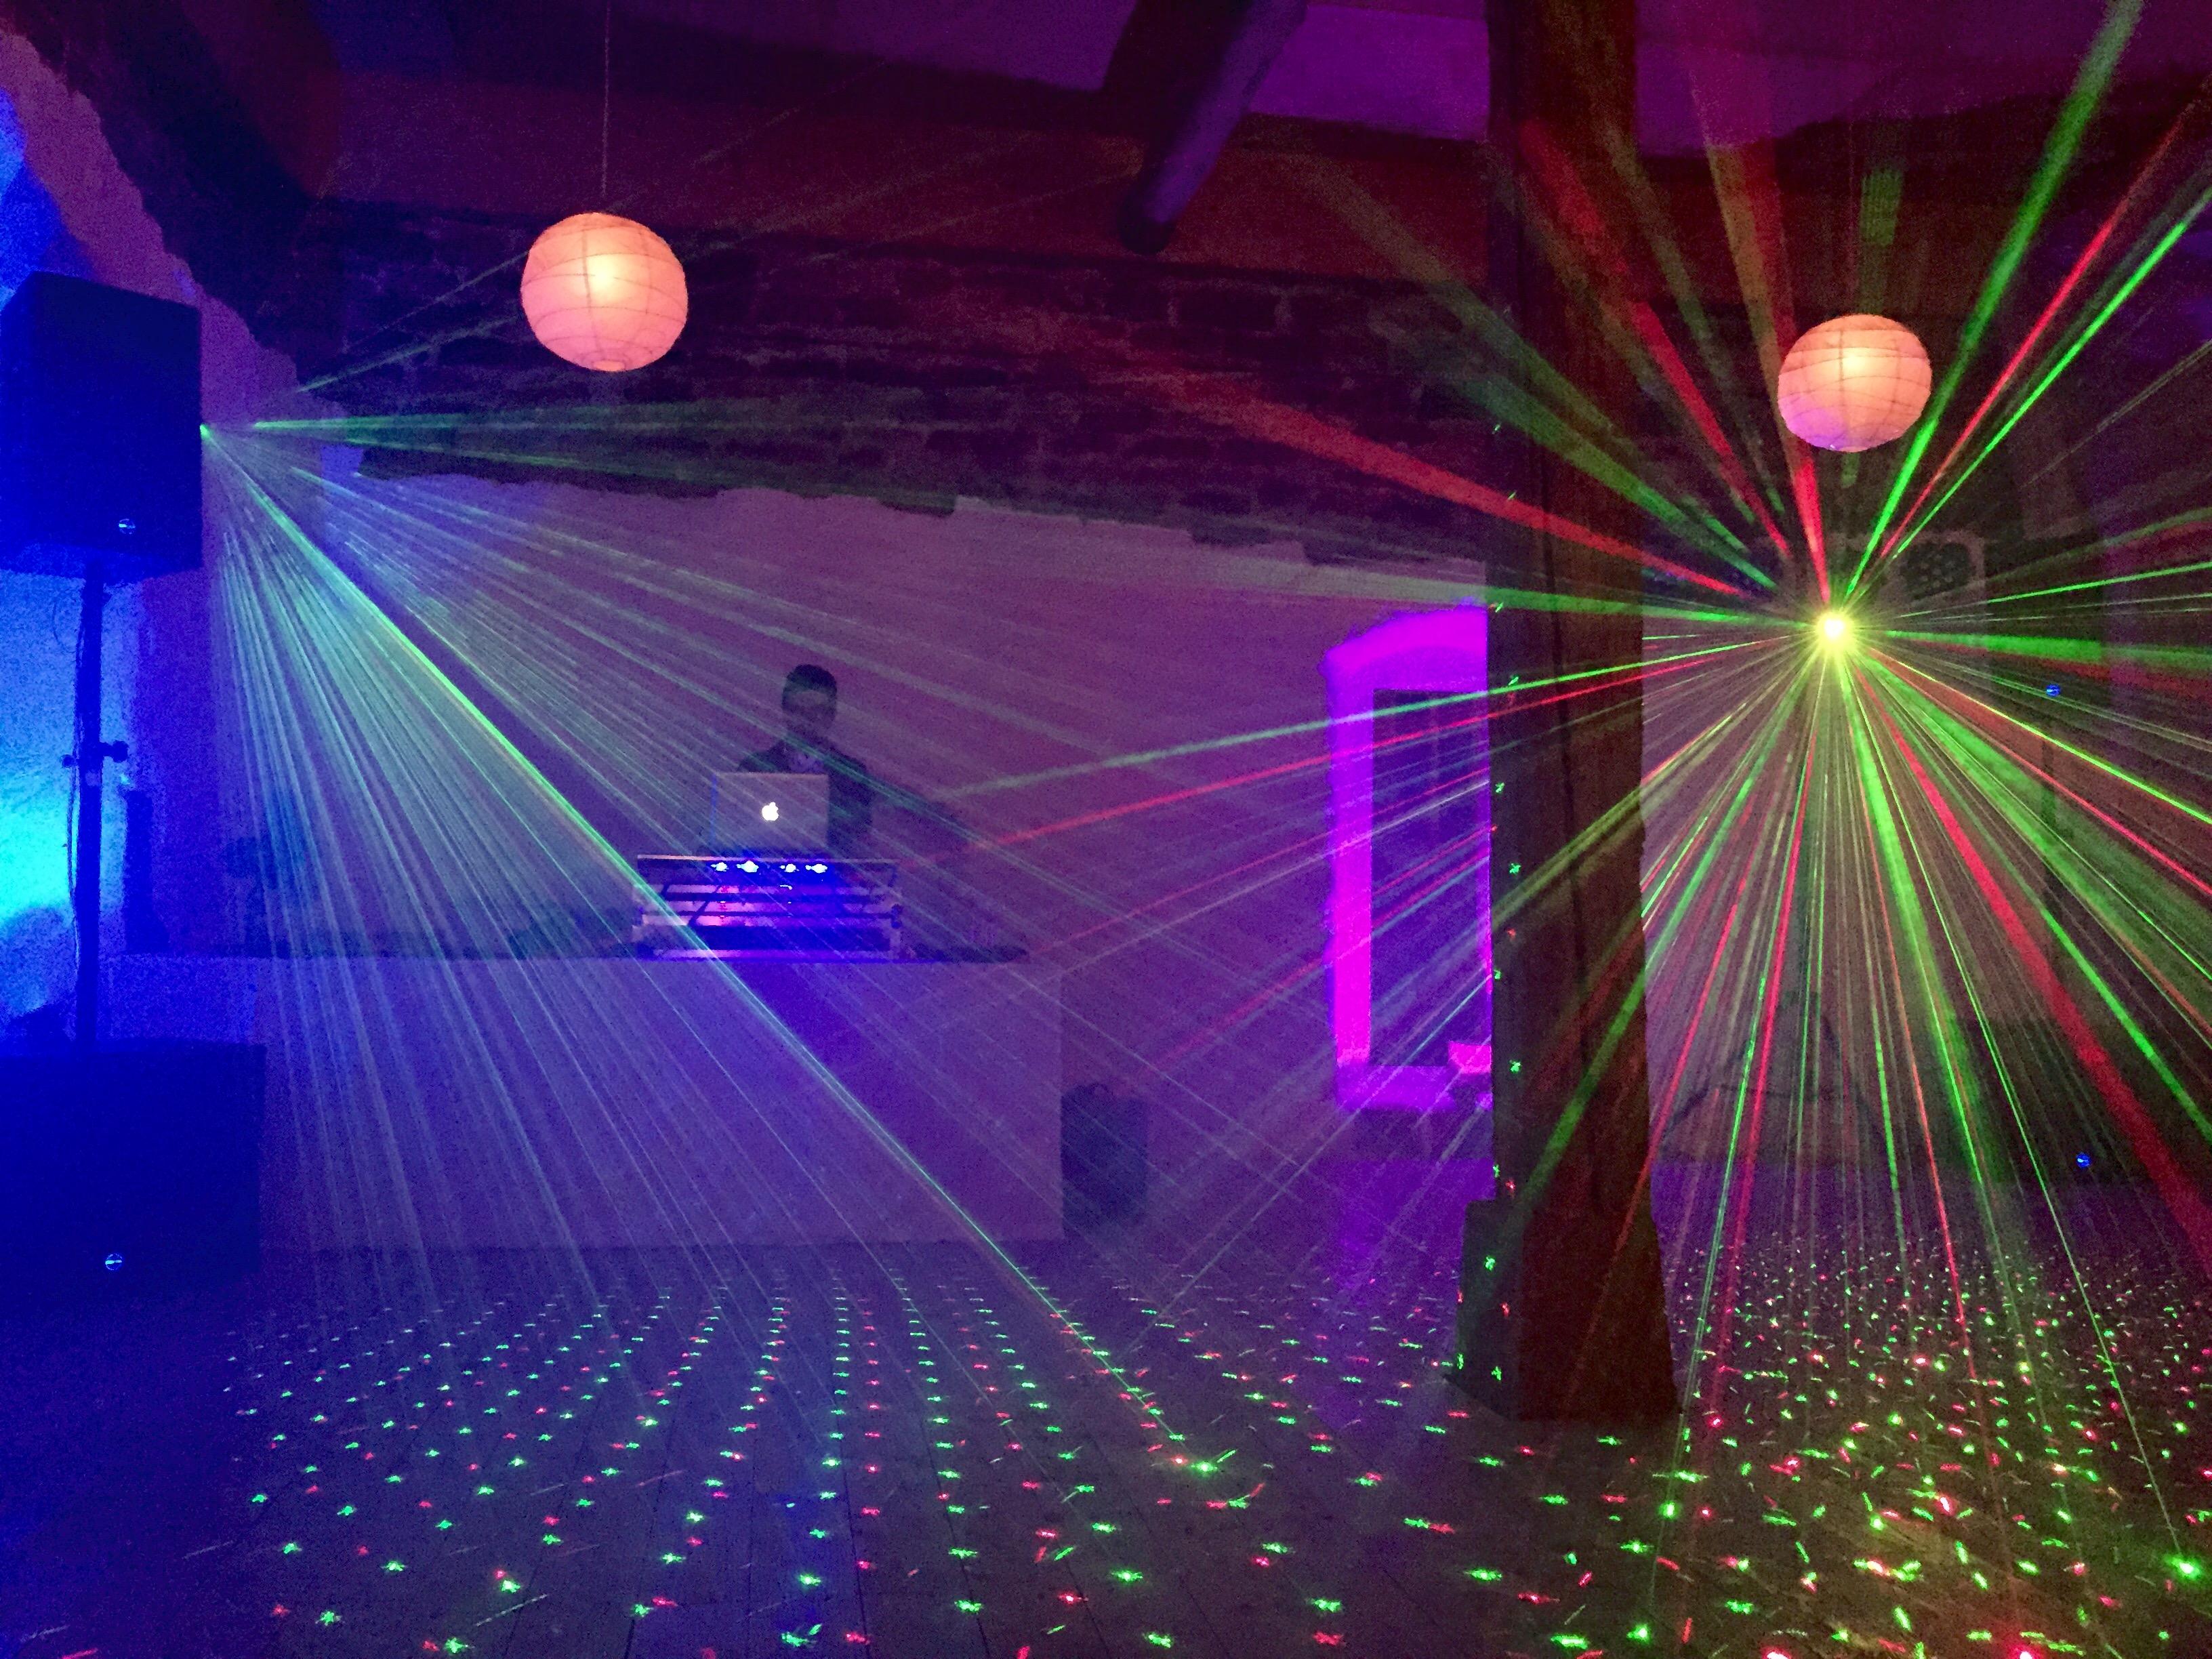 DJ CL-Shorty, Geburtstags DJ, Feier